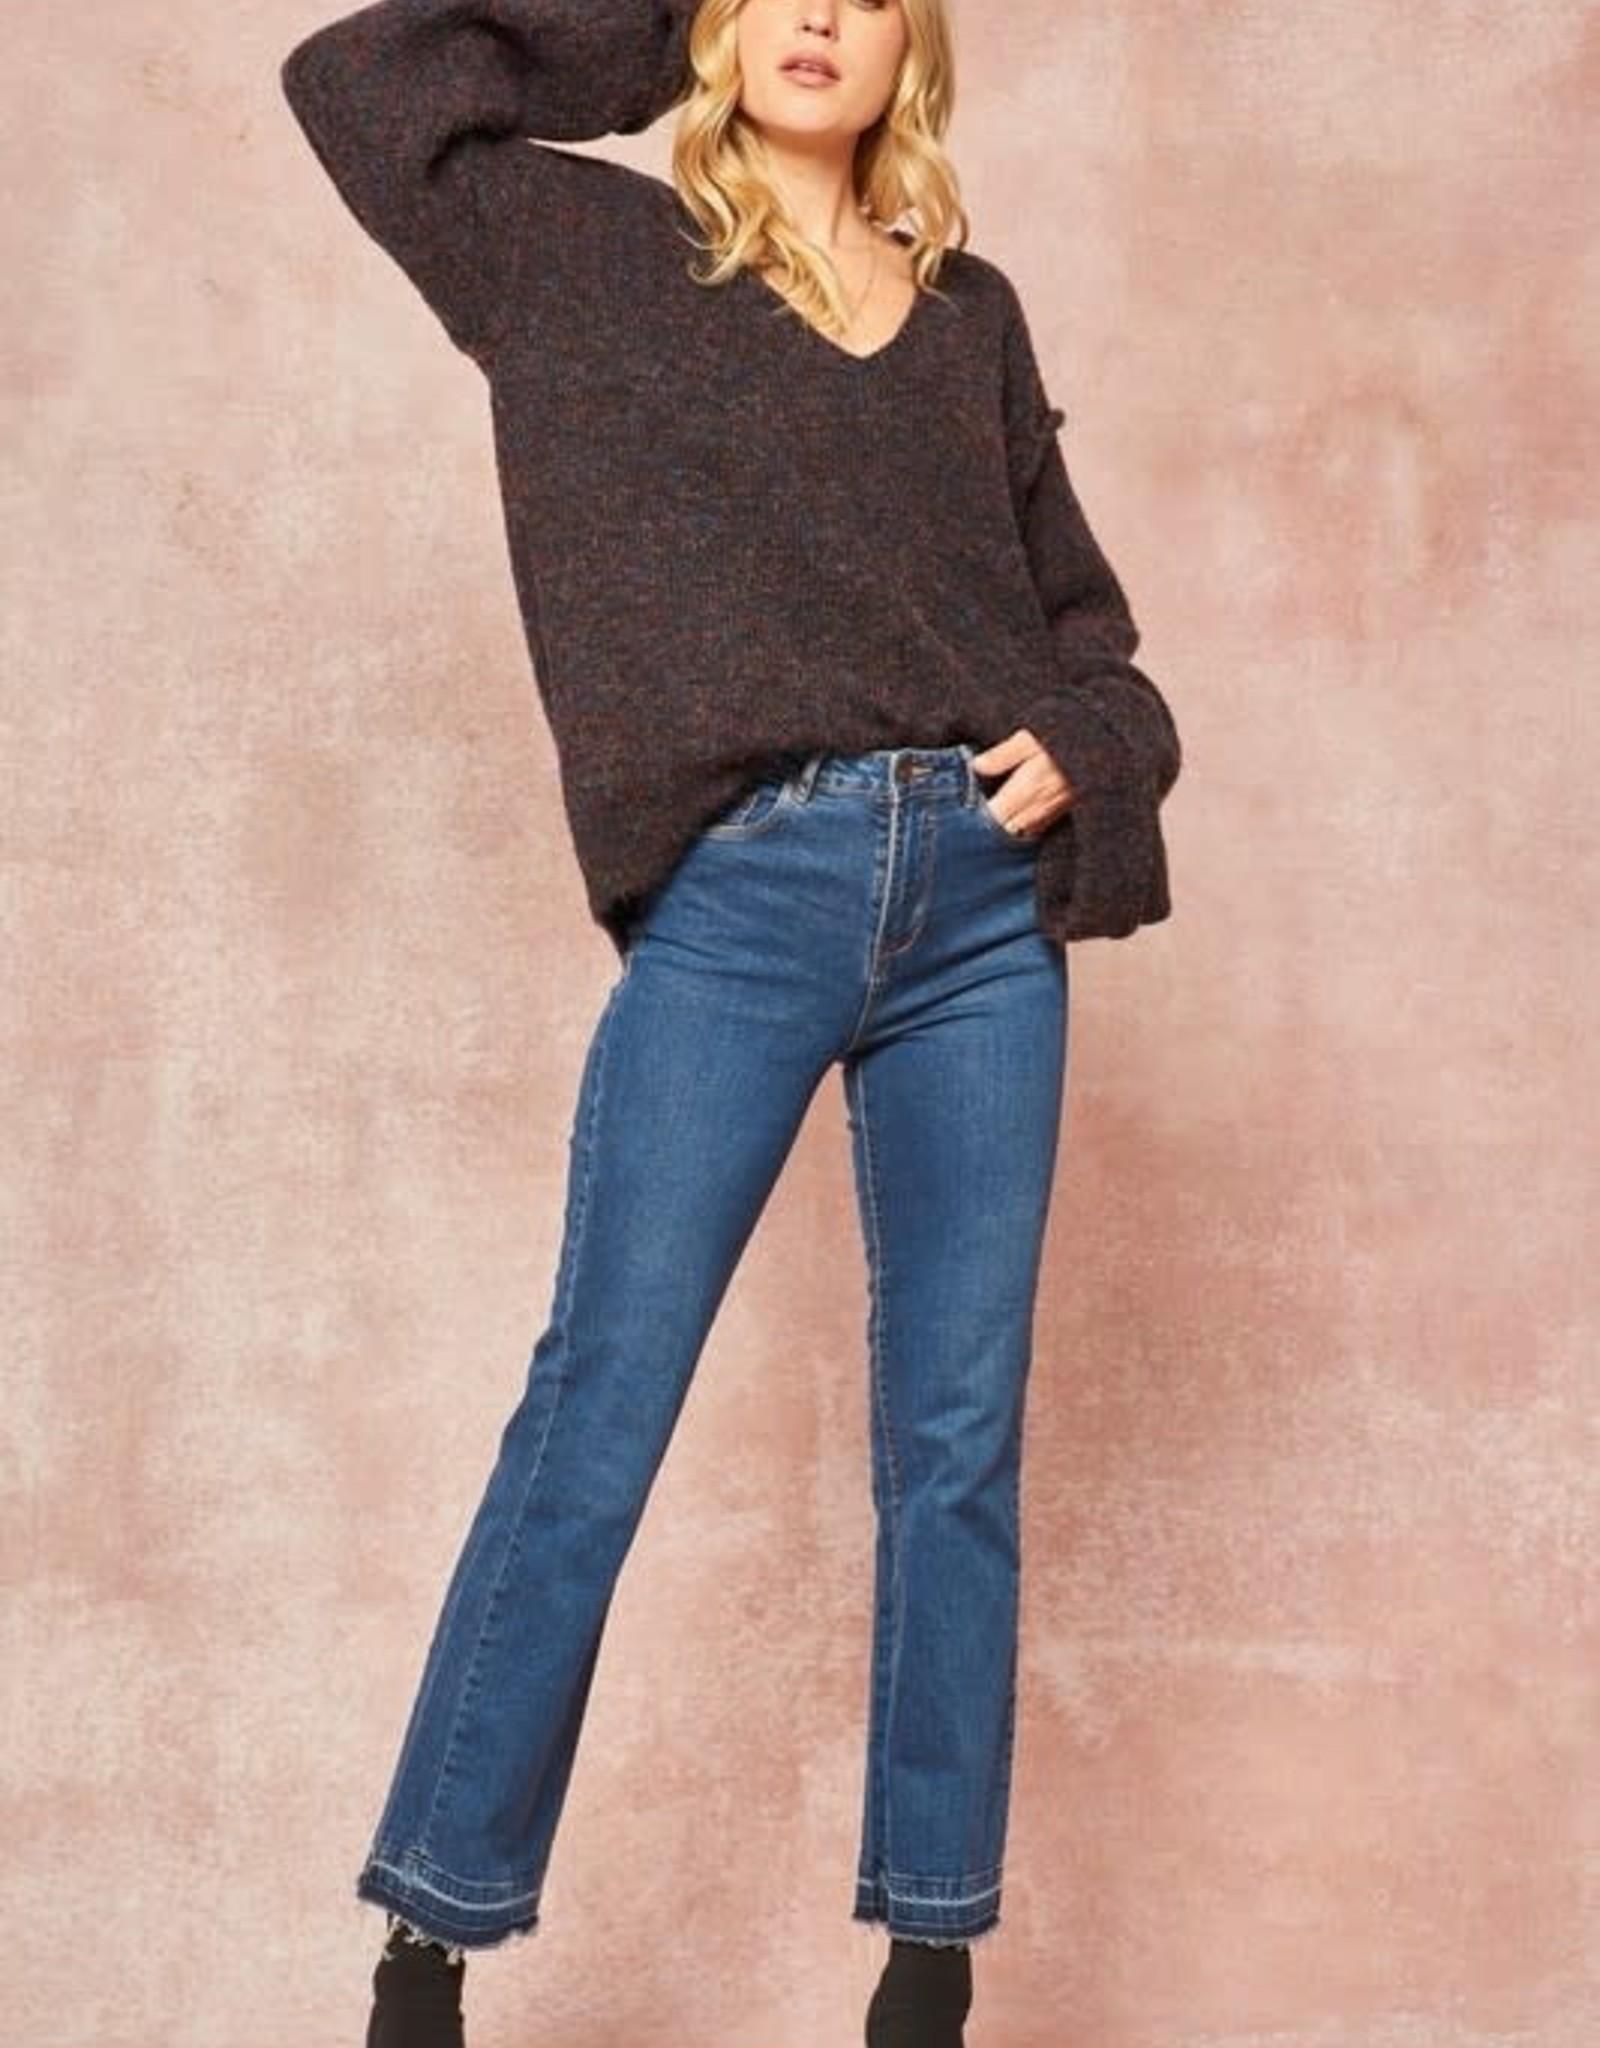 Mulberry Lane Sweater